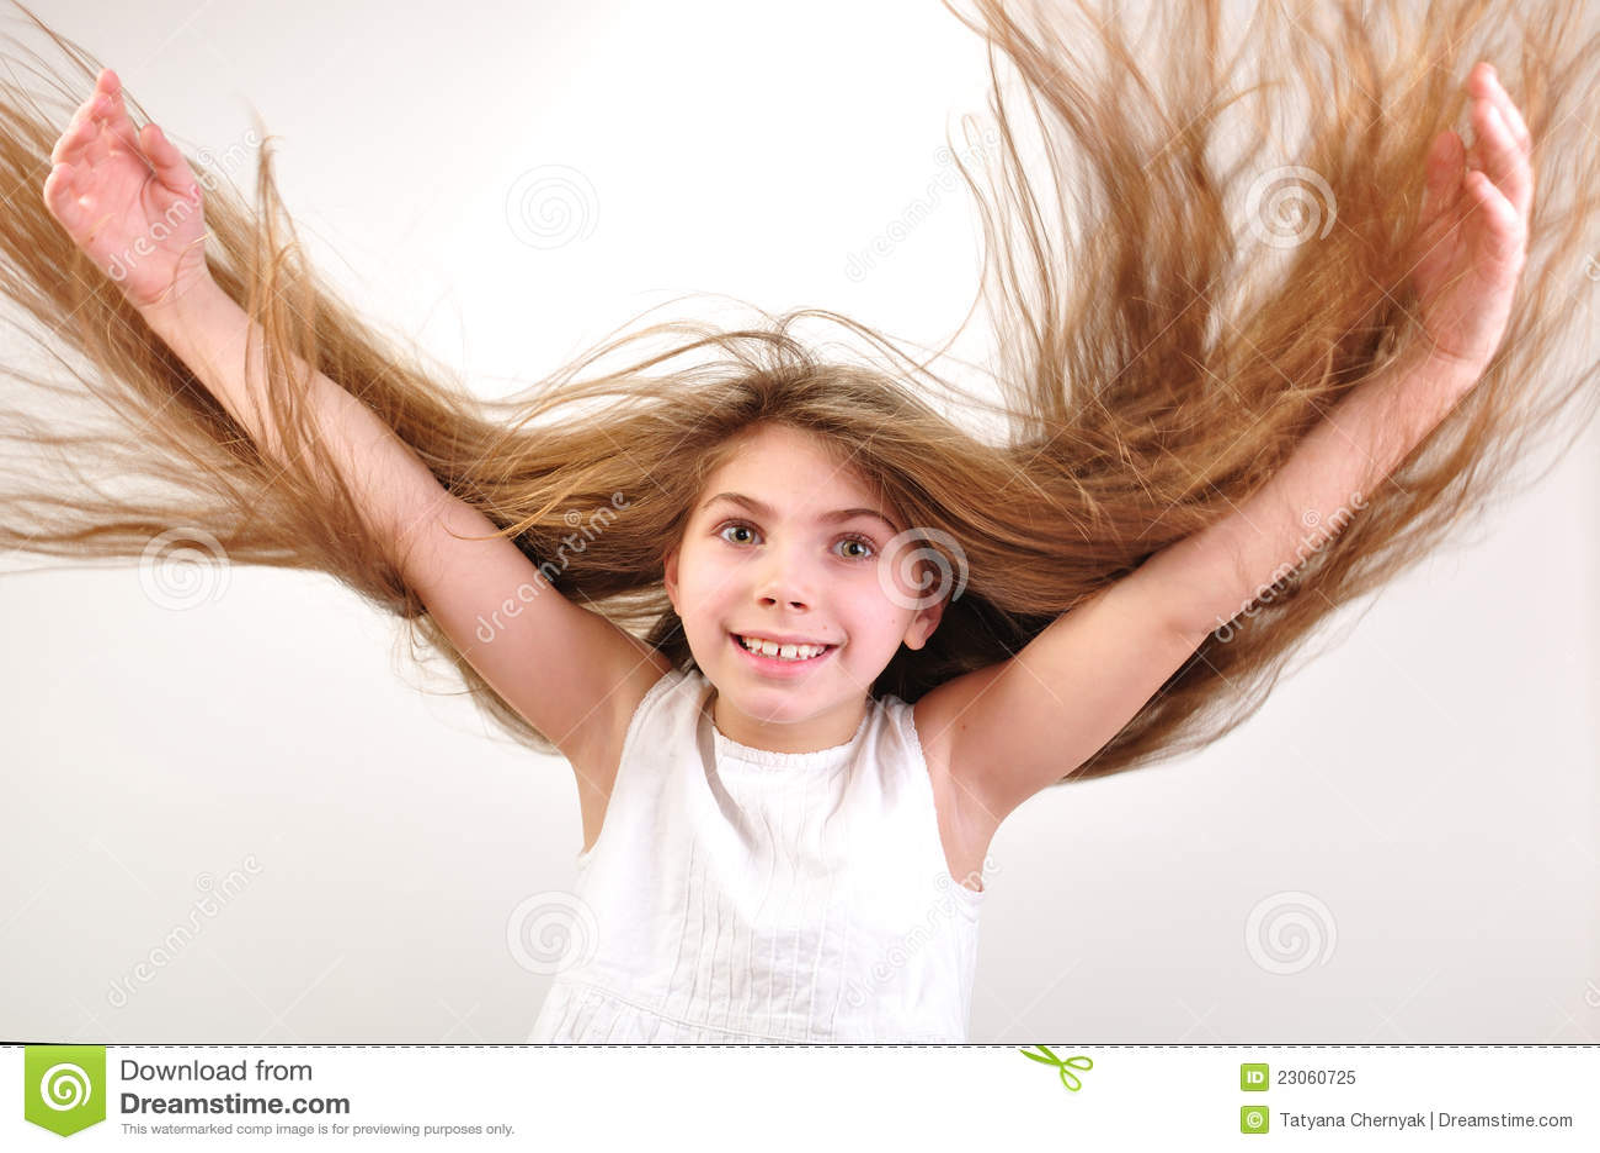 hair stock photos - photo #21